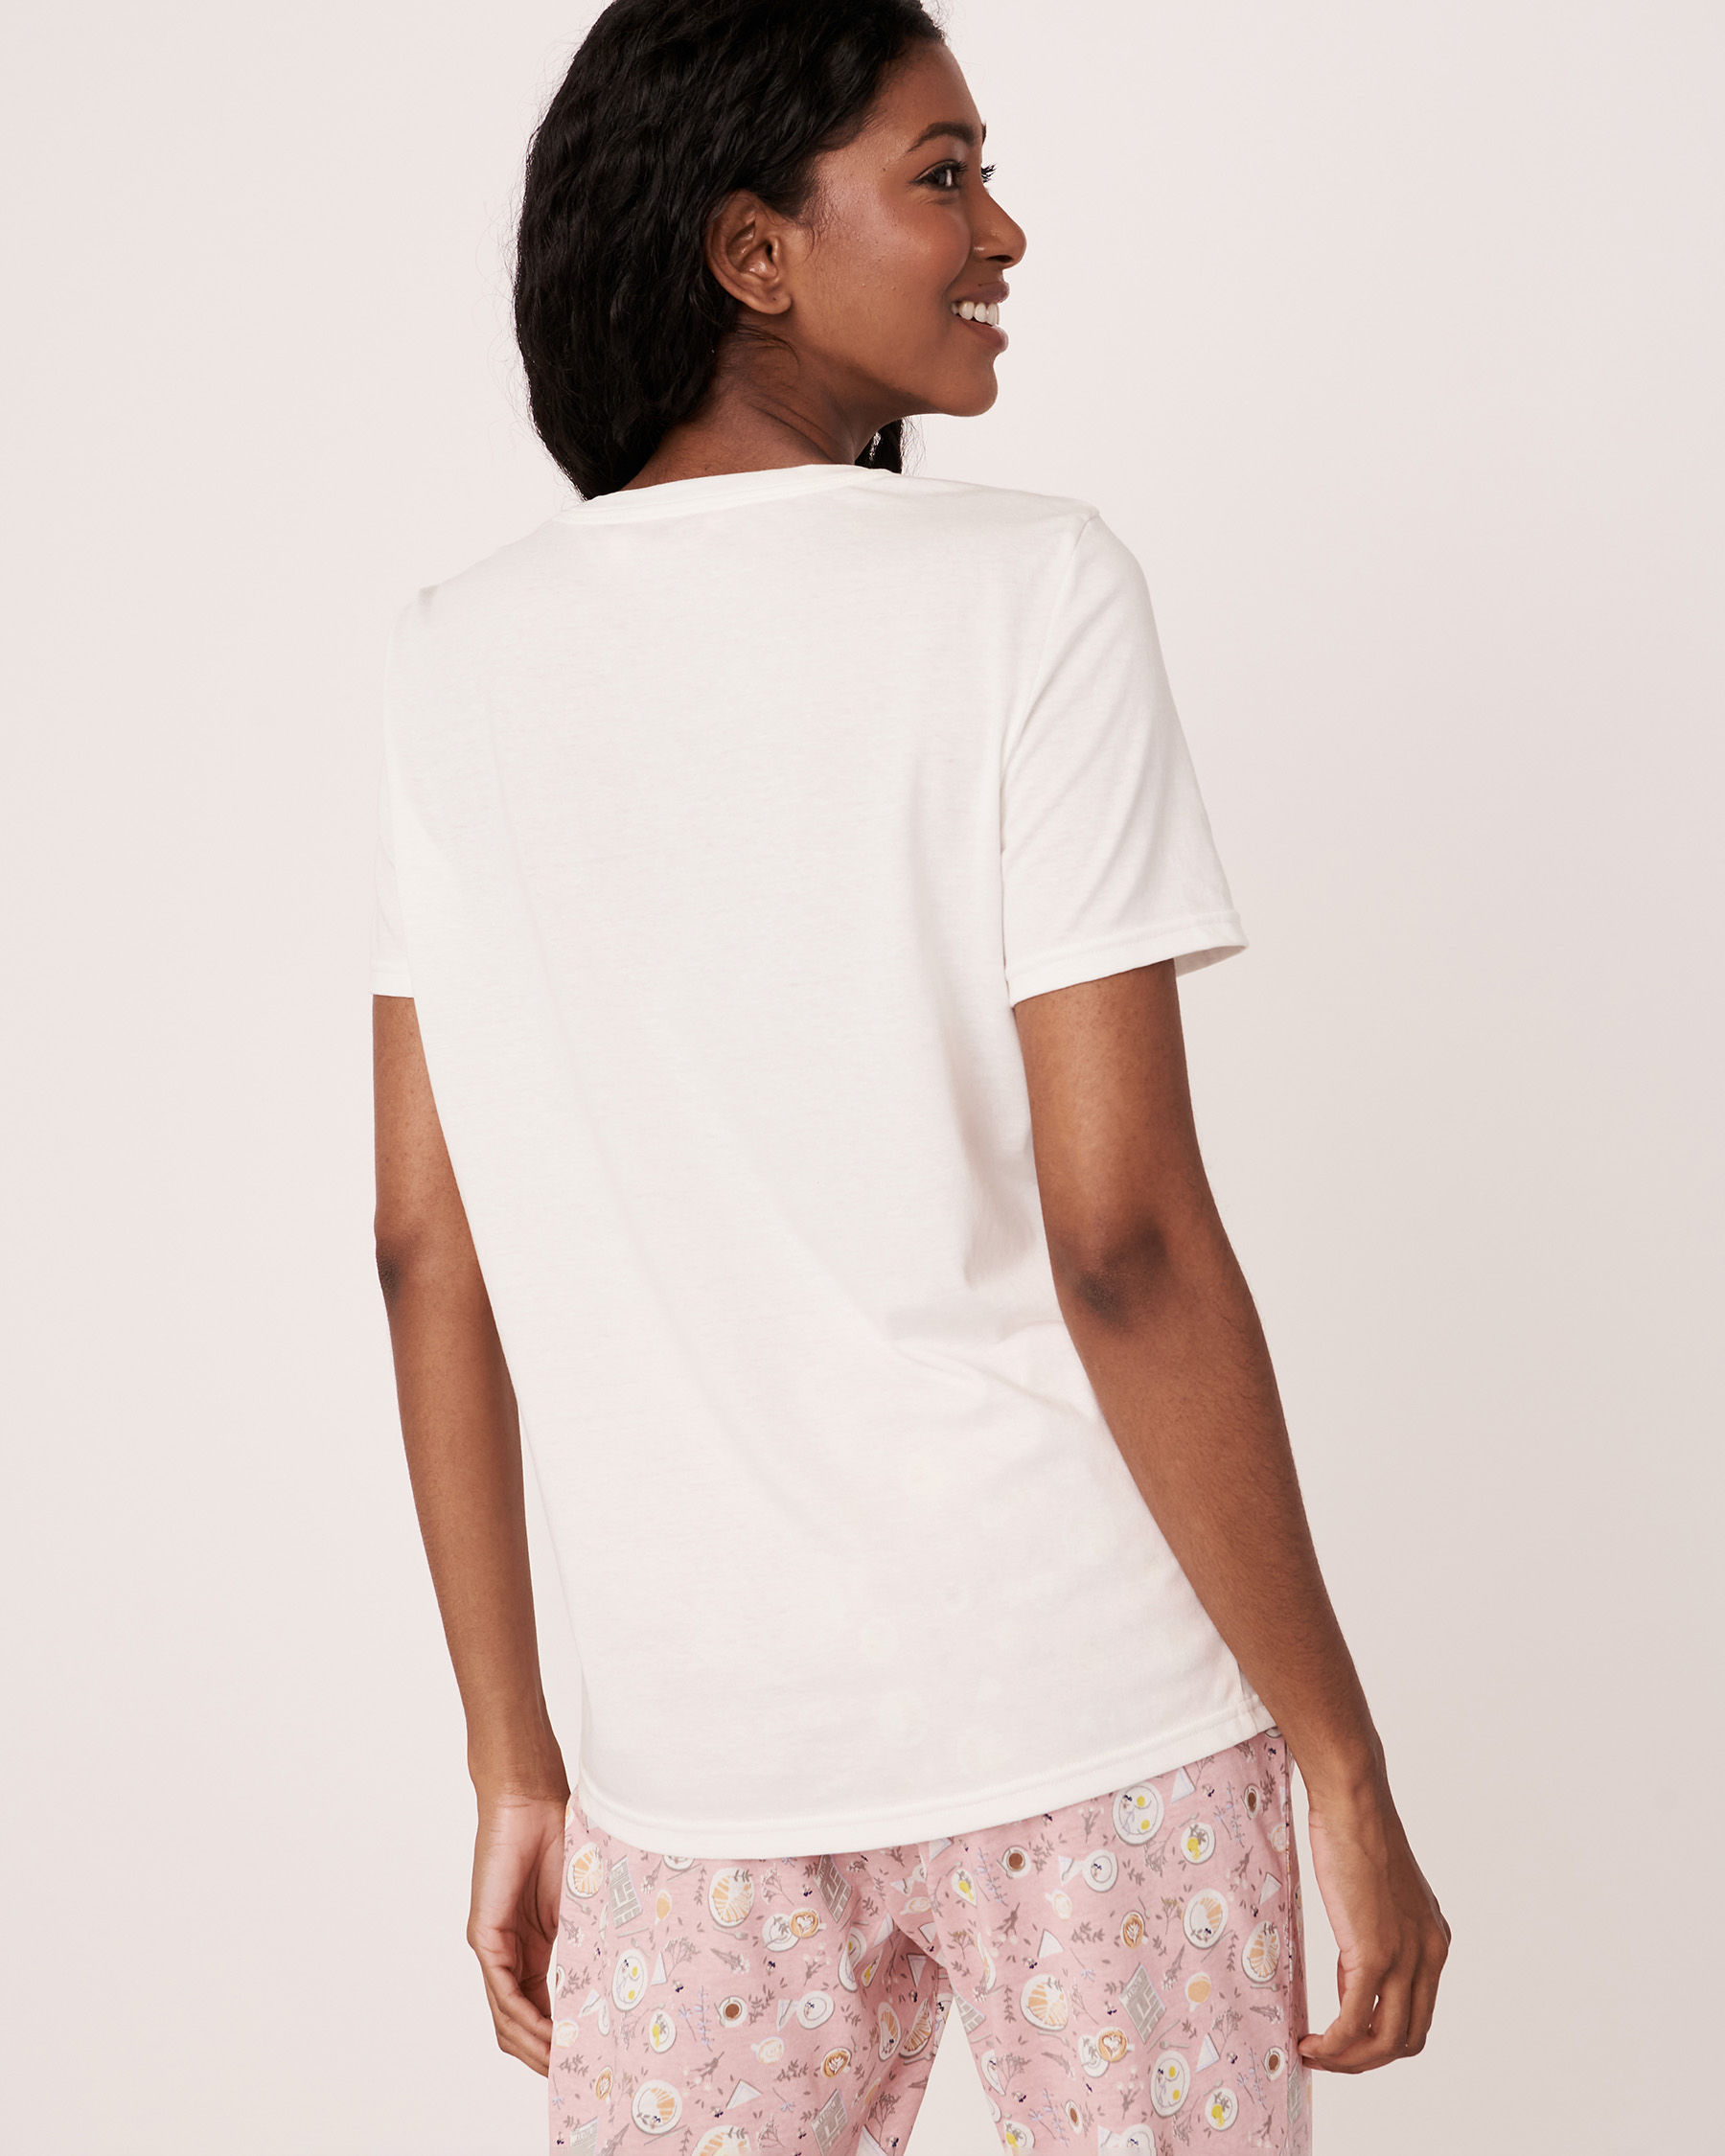 LA VIE EN ROSE Scoop Neckline T-shirt White 40100104 - View3